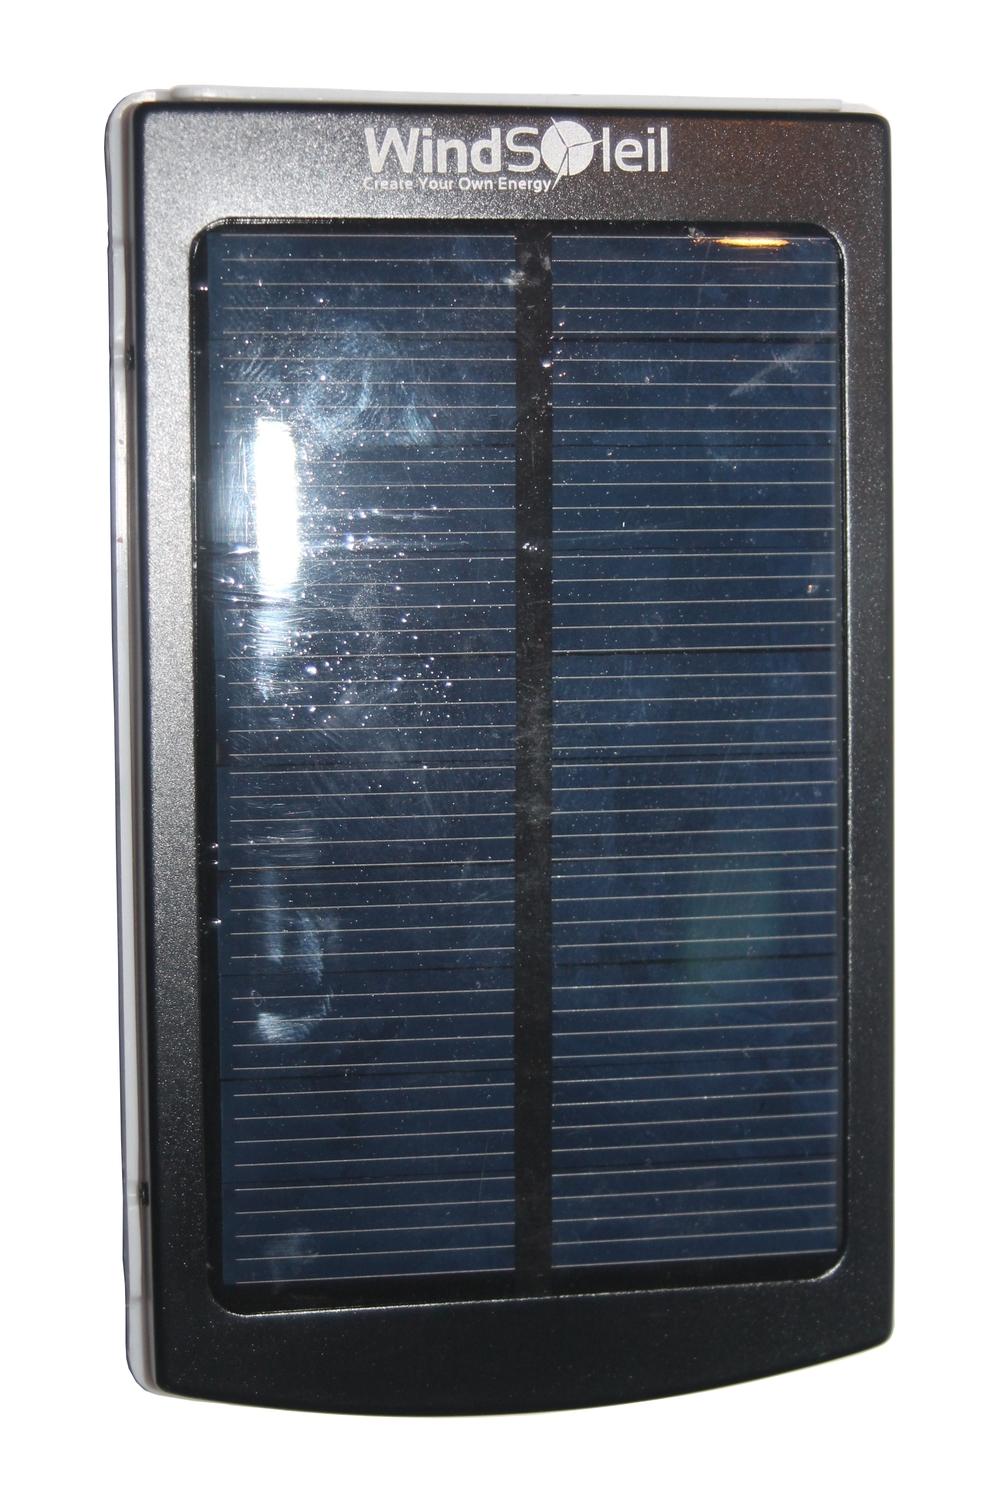 Windsoleil Quot Wala Quot Solar Power 10000mah Portable Battery